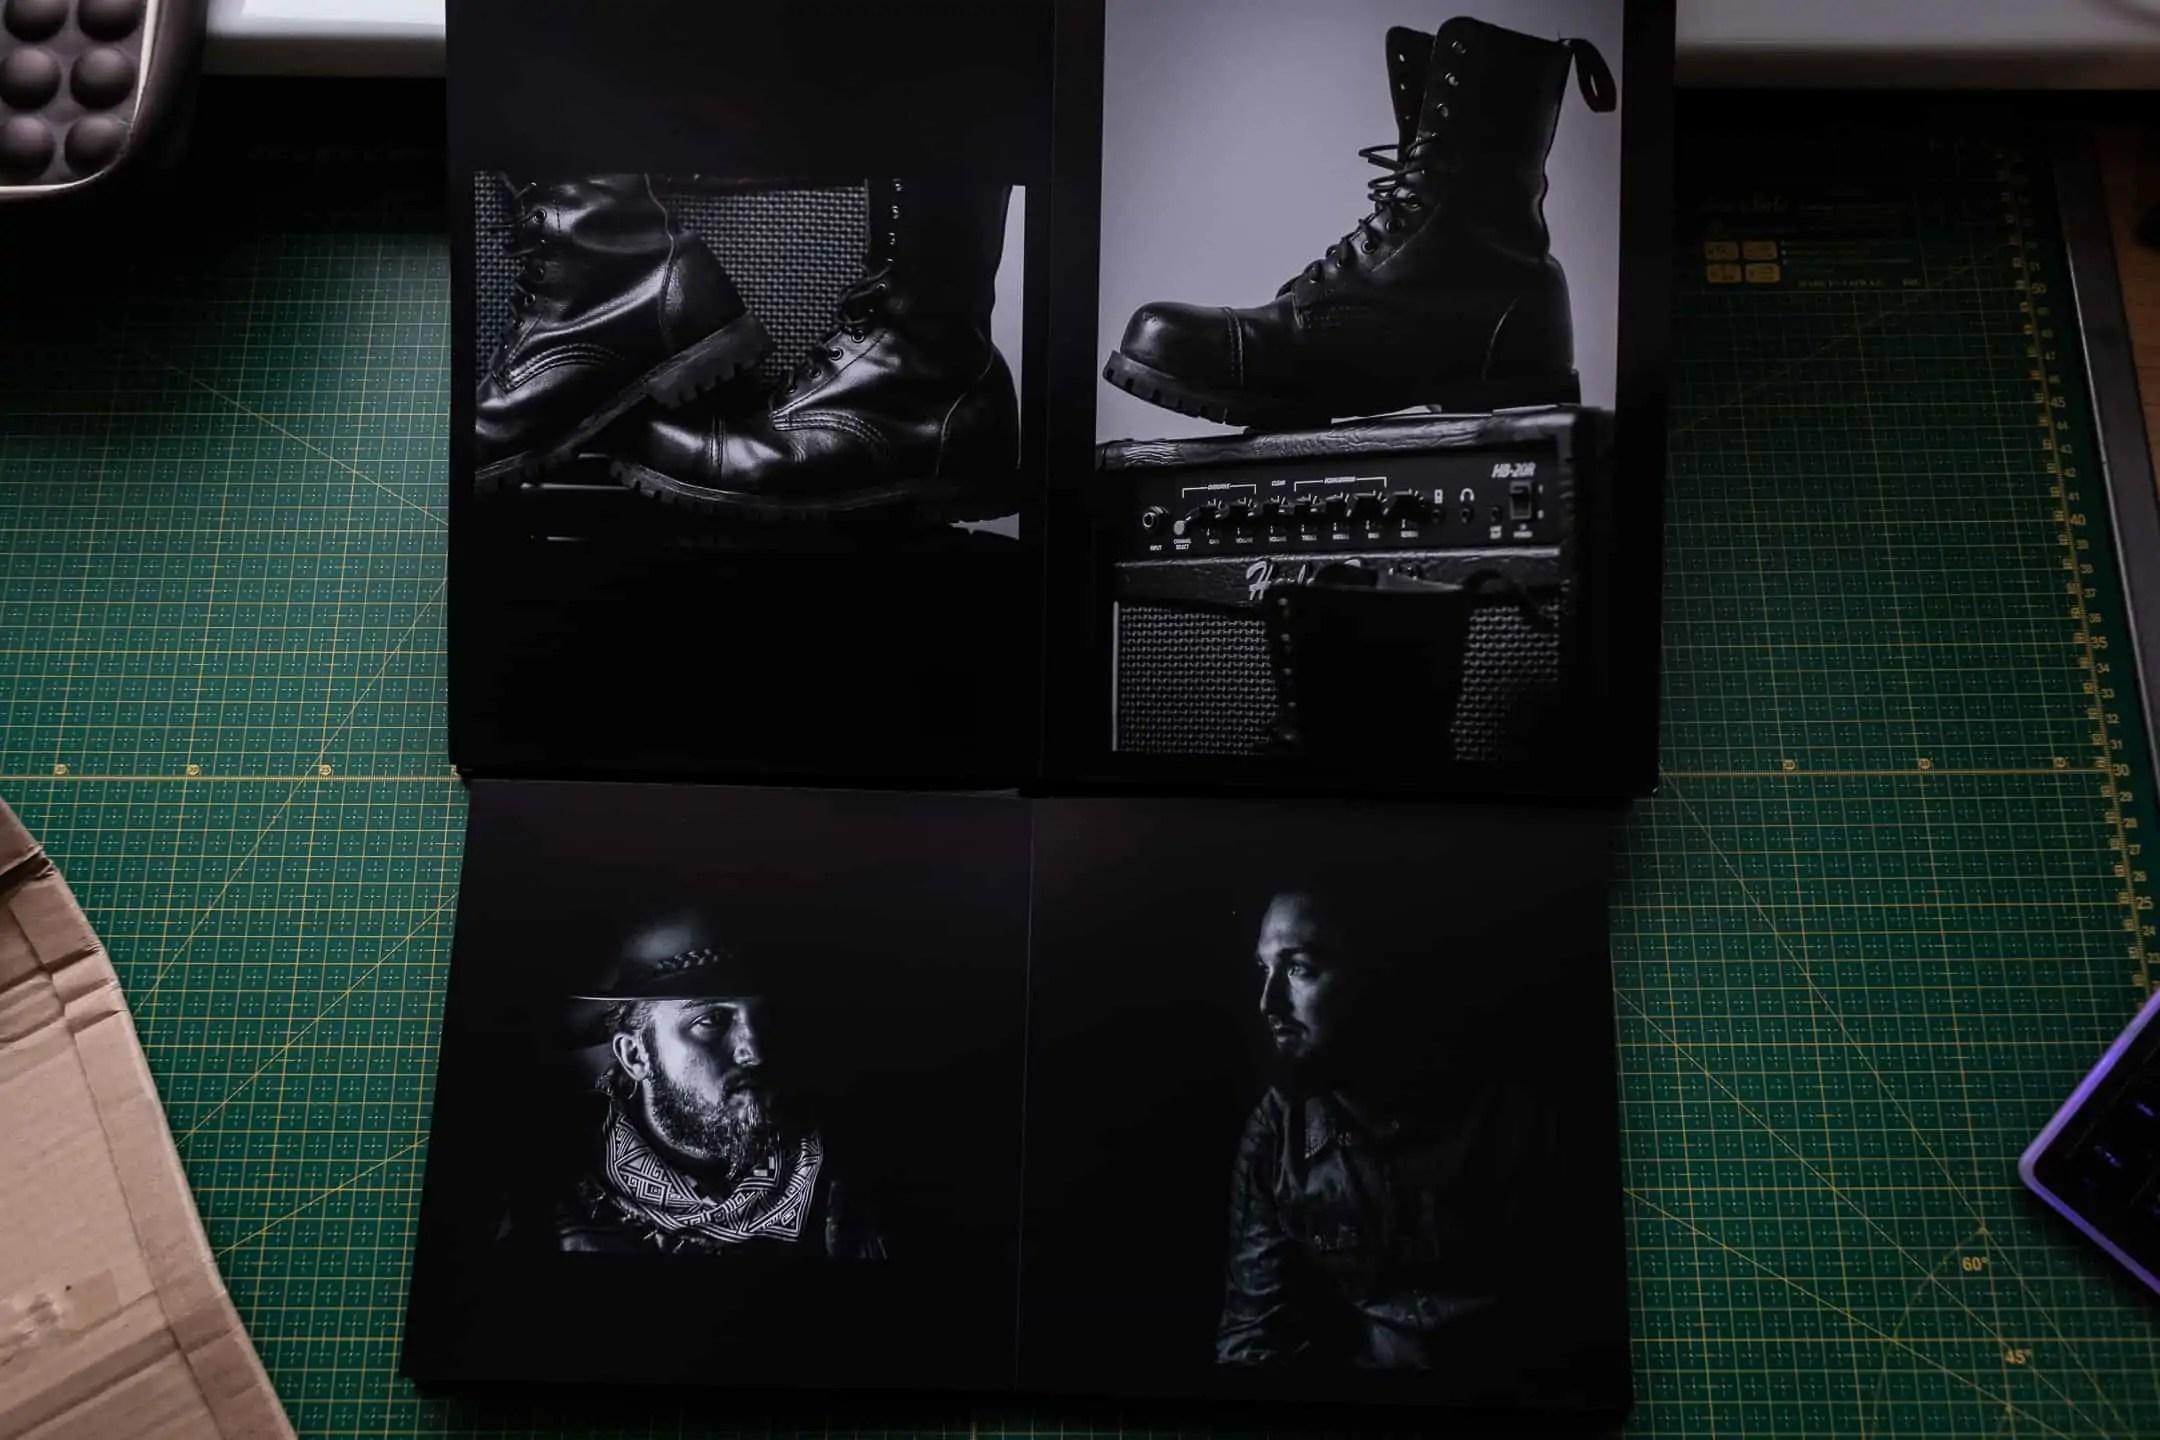 Własna fotoksiążka saal digital 16 - Saal design, pixbook - książki fotograficzne